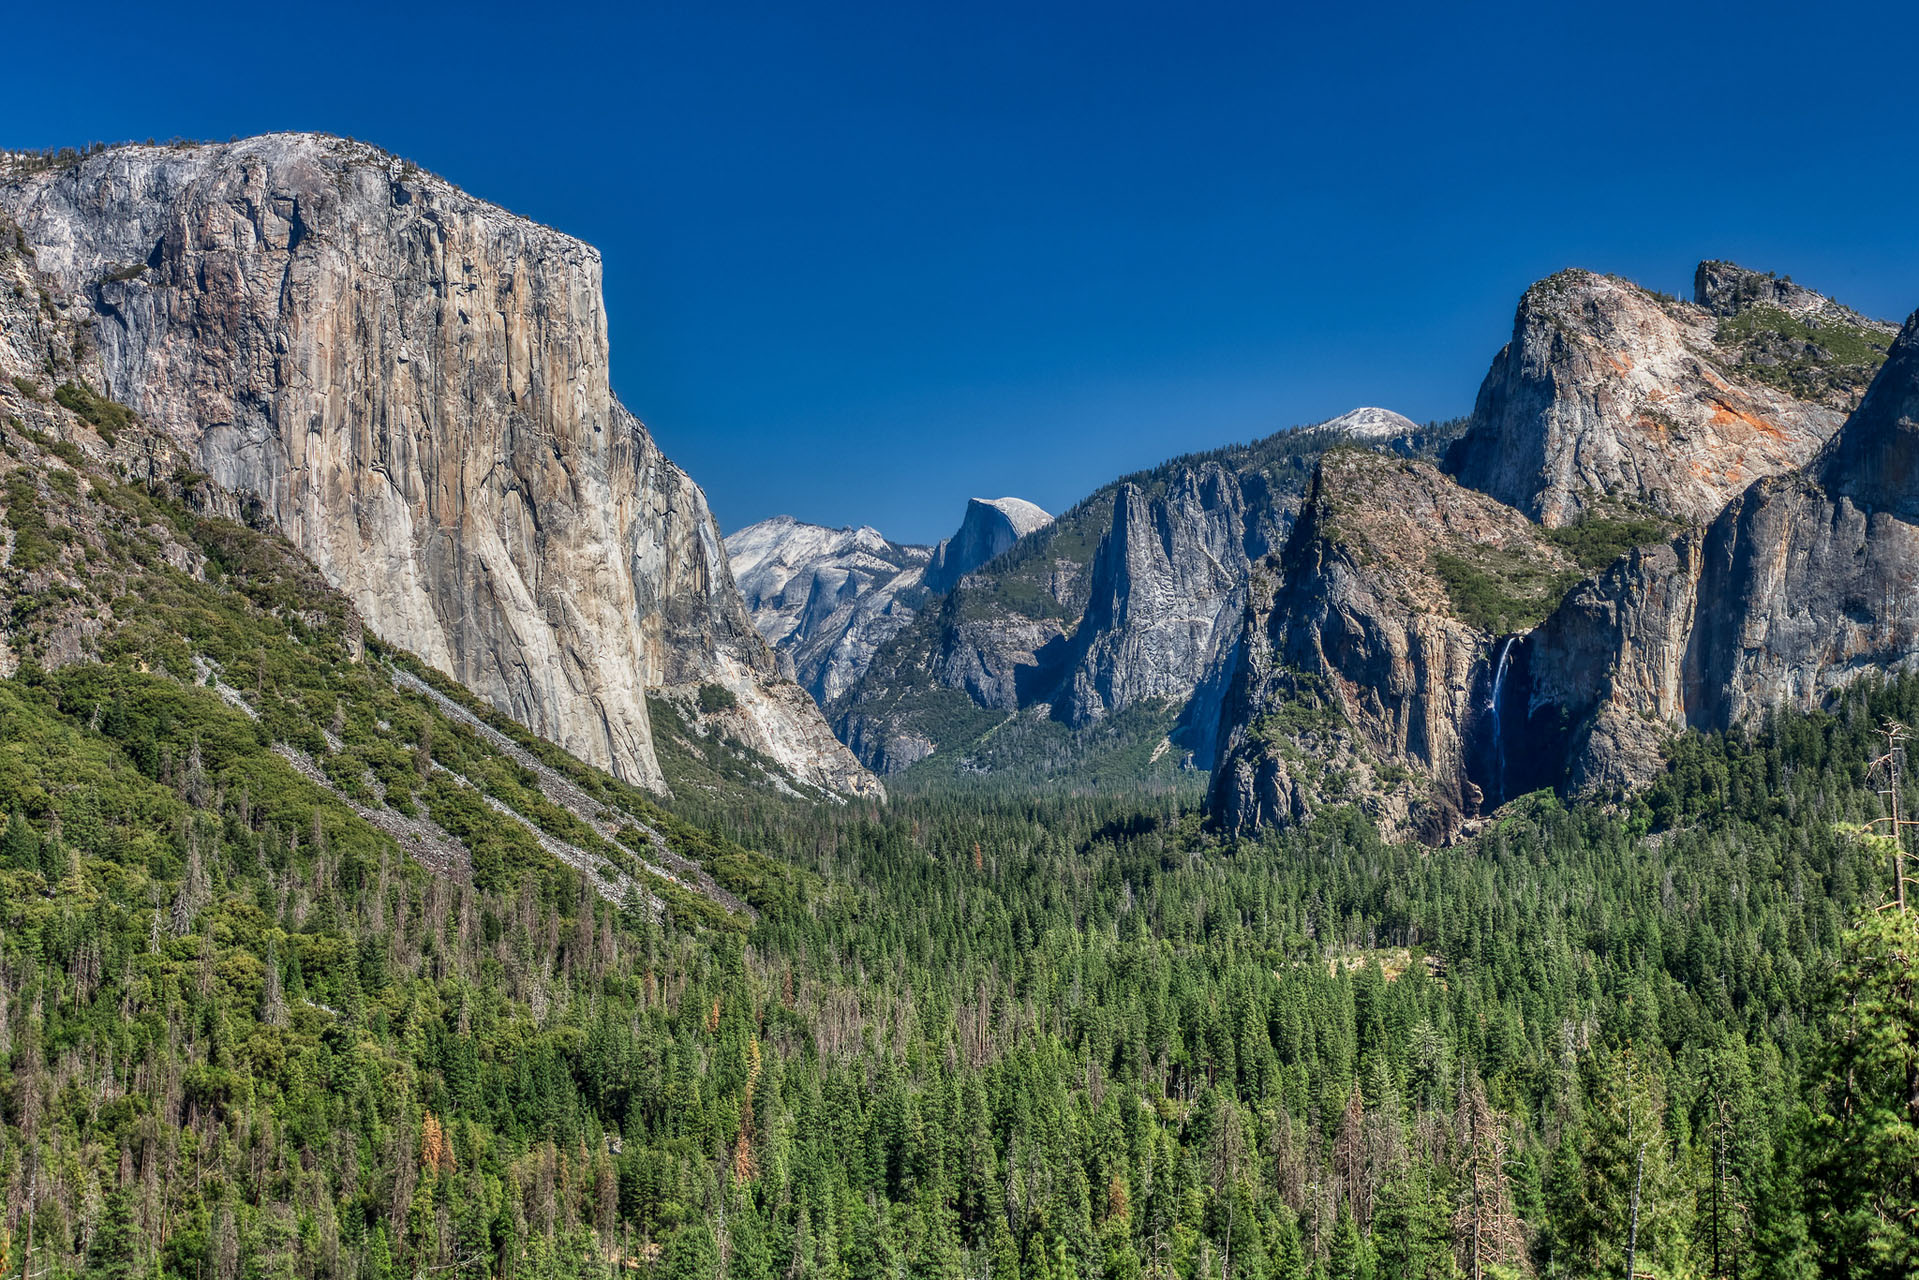 Yosemite National Park: Taking Photos of Half Dome and El Capitan